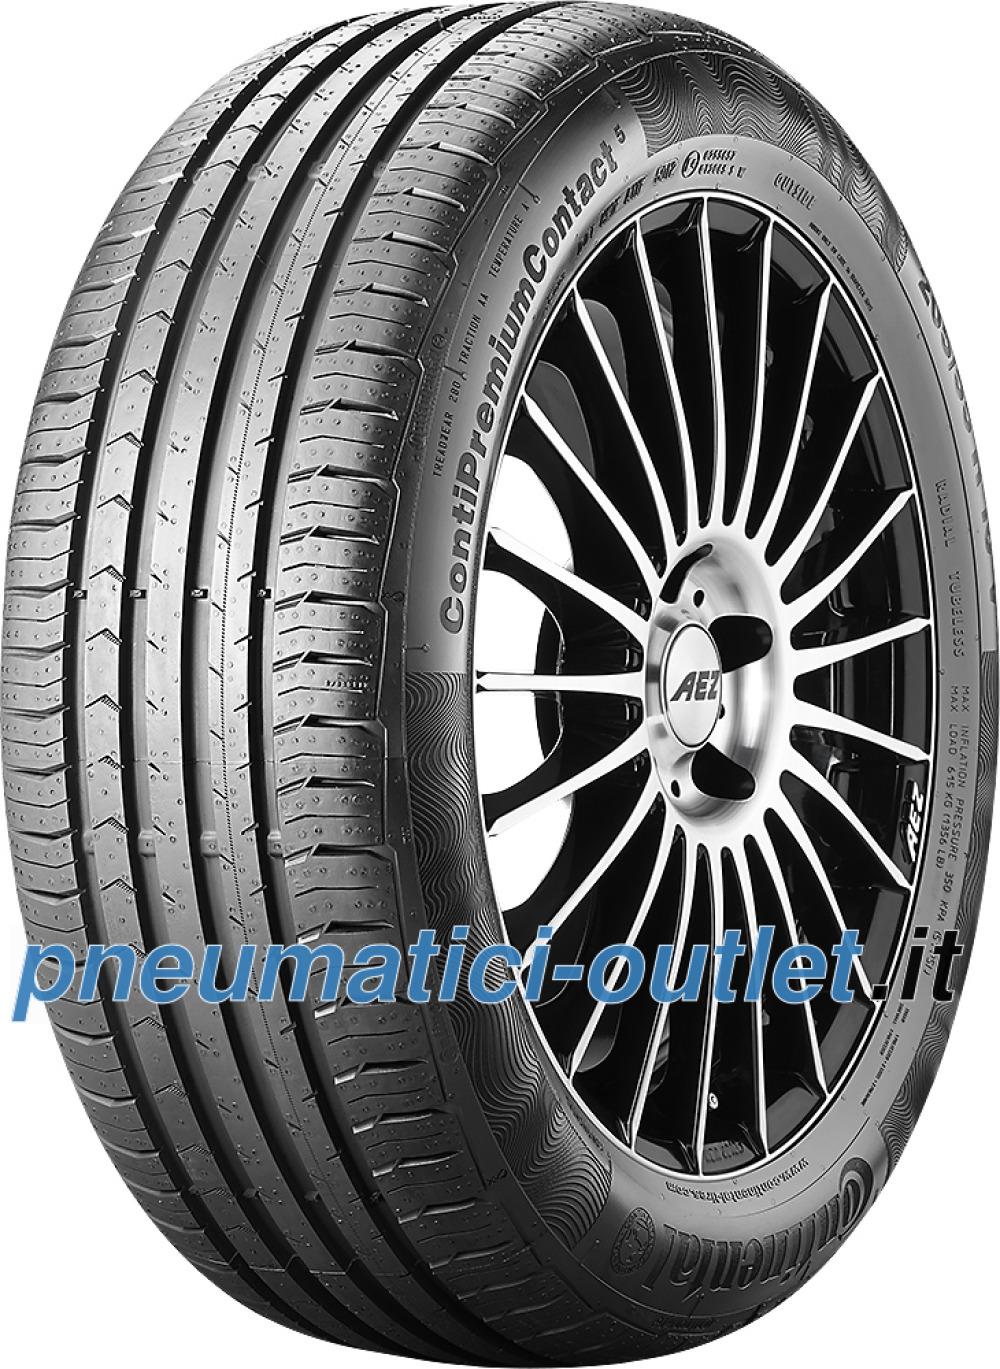 Continental PremiumContact 5 ( 235/55 R17 103W XL )